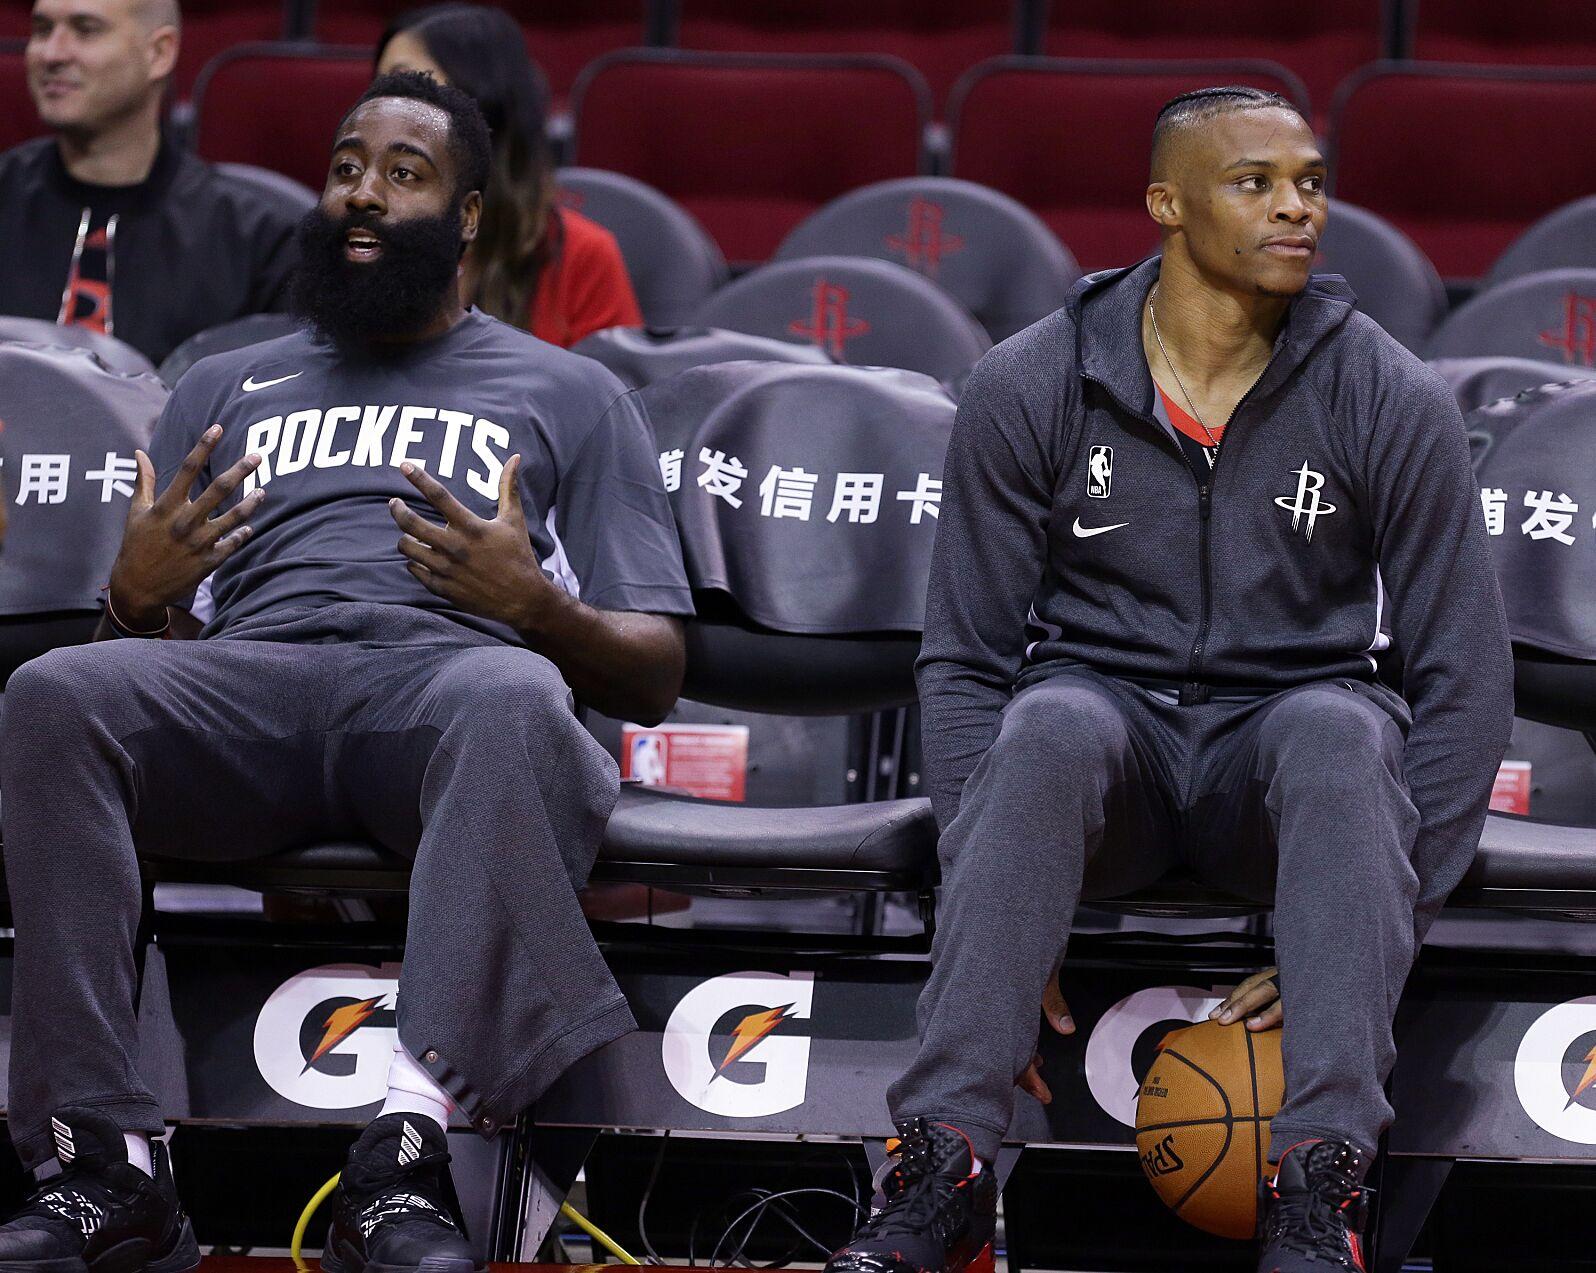 Houston Rockets: Returning to peak form in eight-game win streak